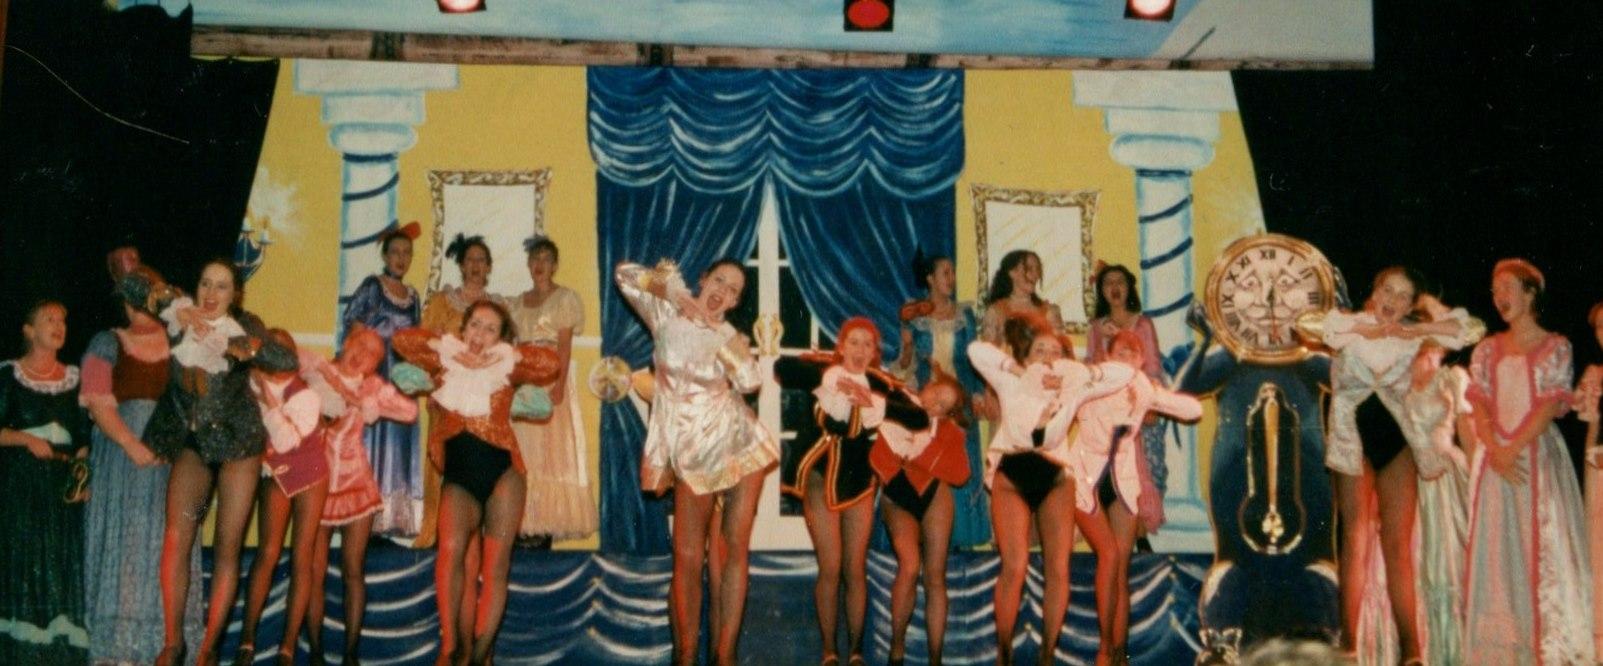 Cinderella 1998 (www.lmvg.ie) (16)